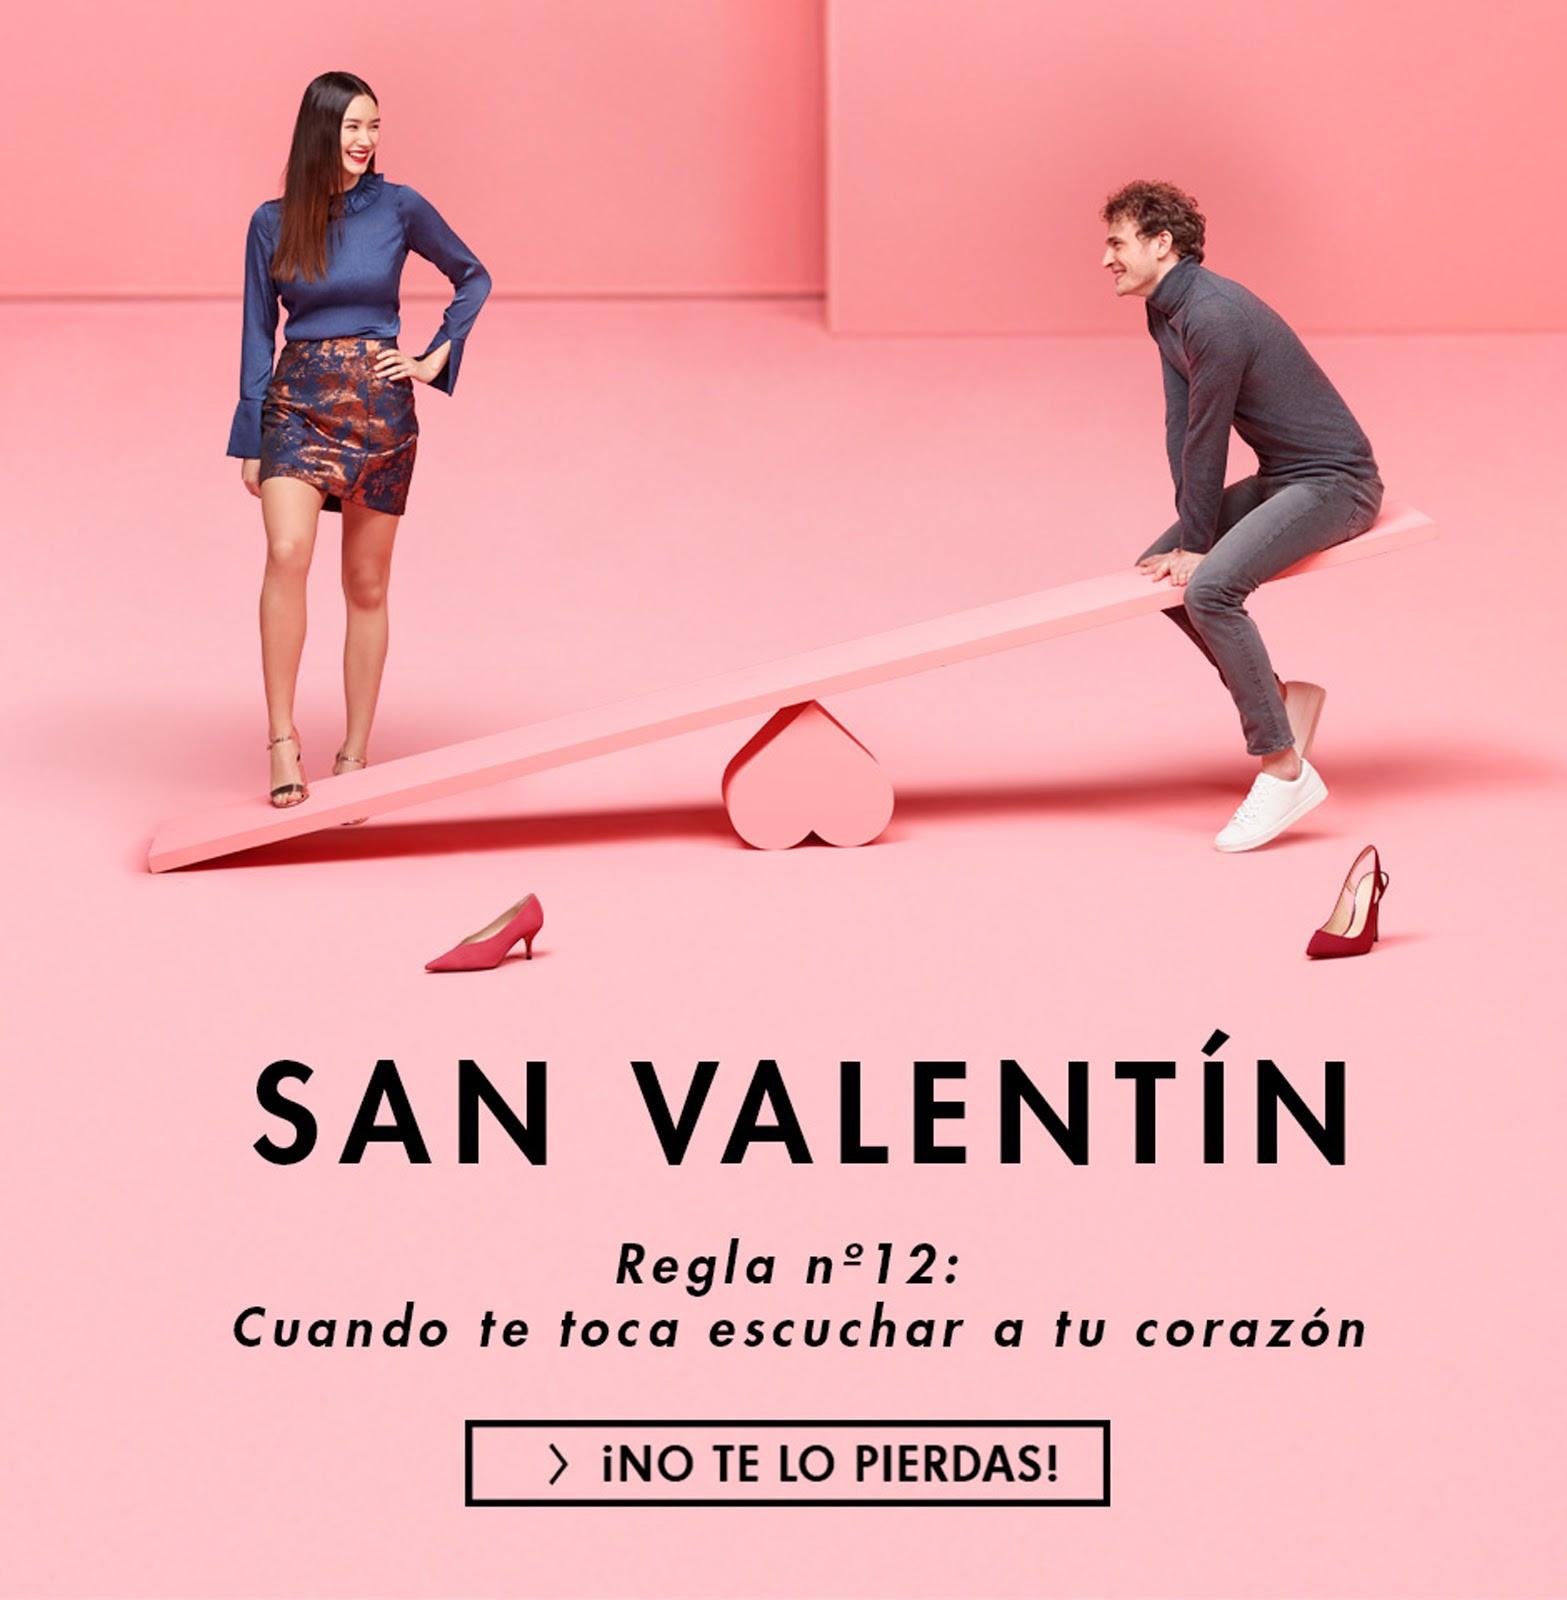 San_Valentin_Barcelona_Maremagnum